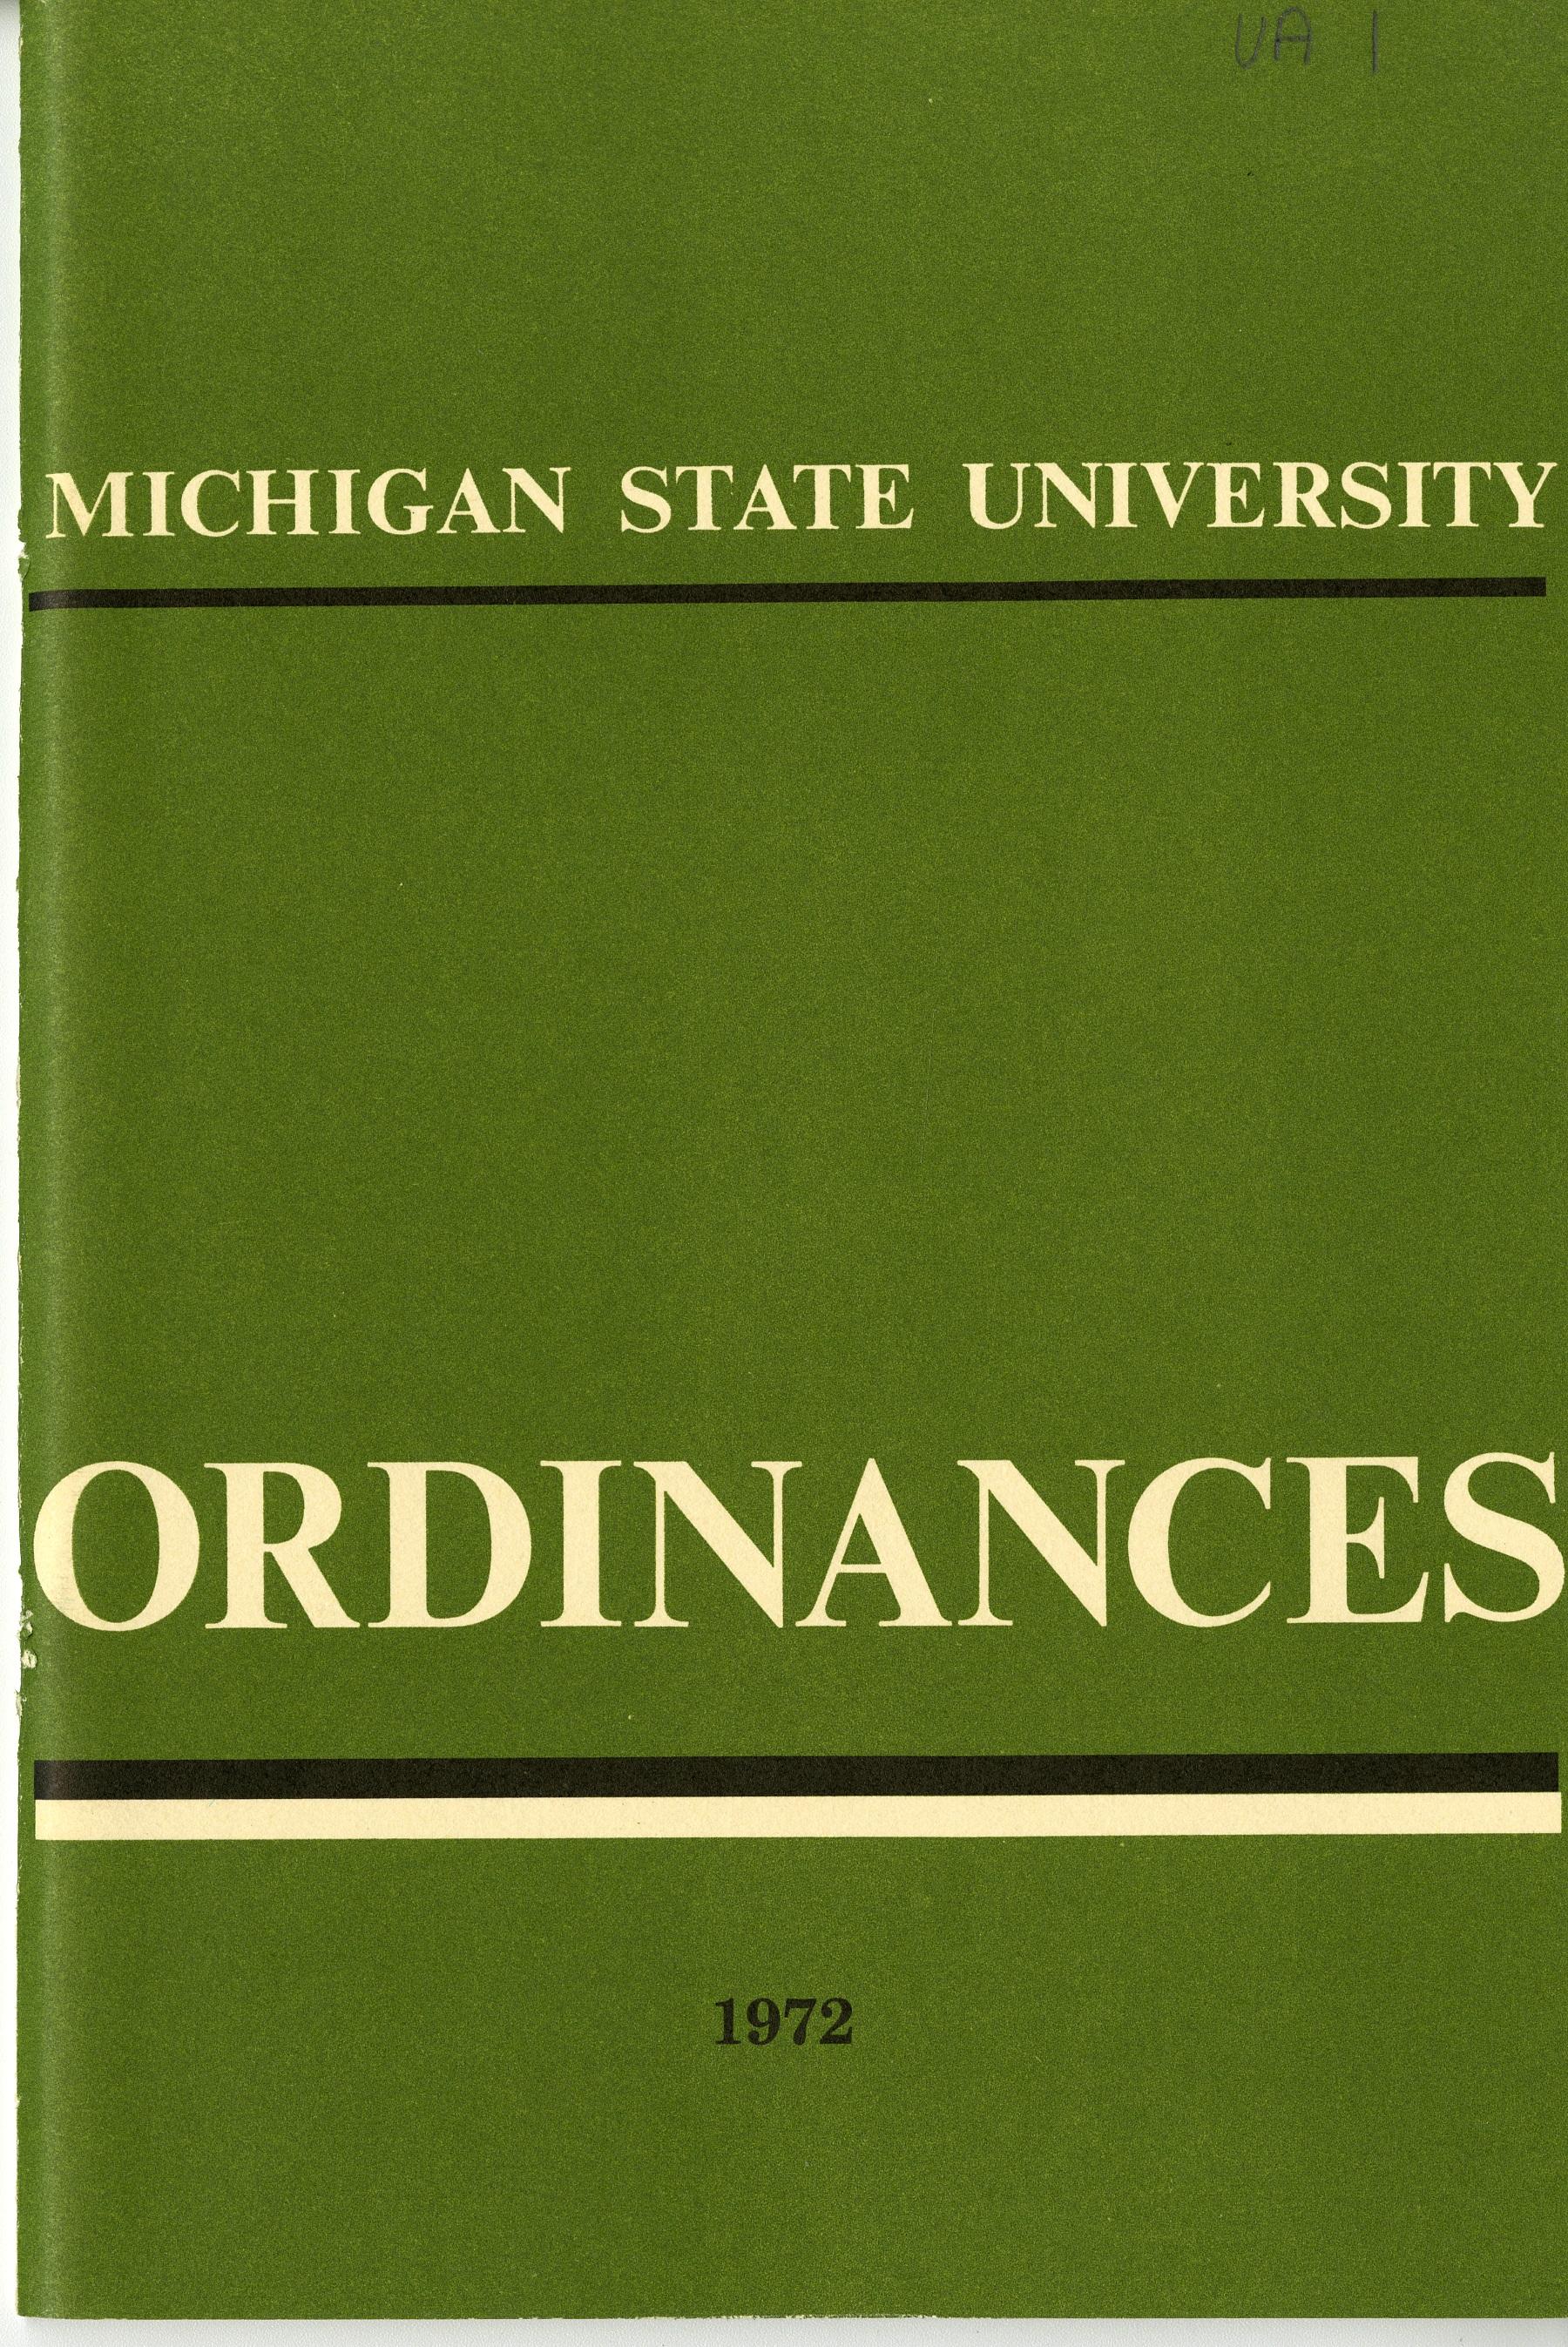 MSU Ordinances, 1972